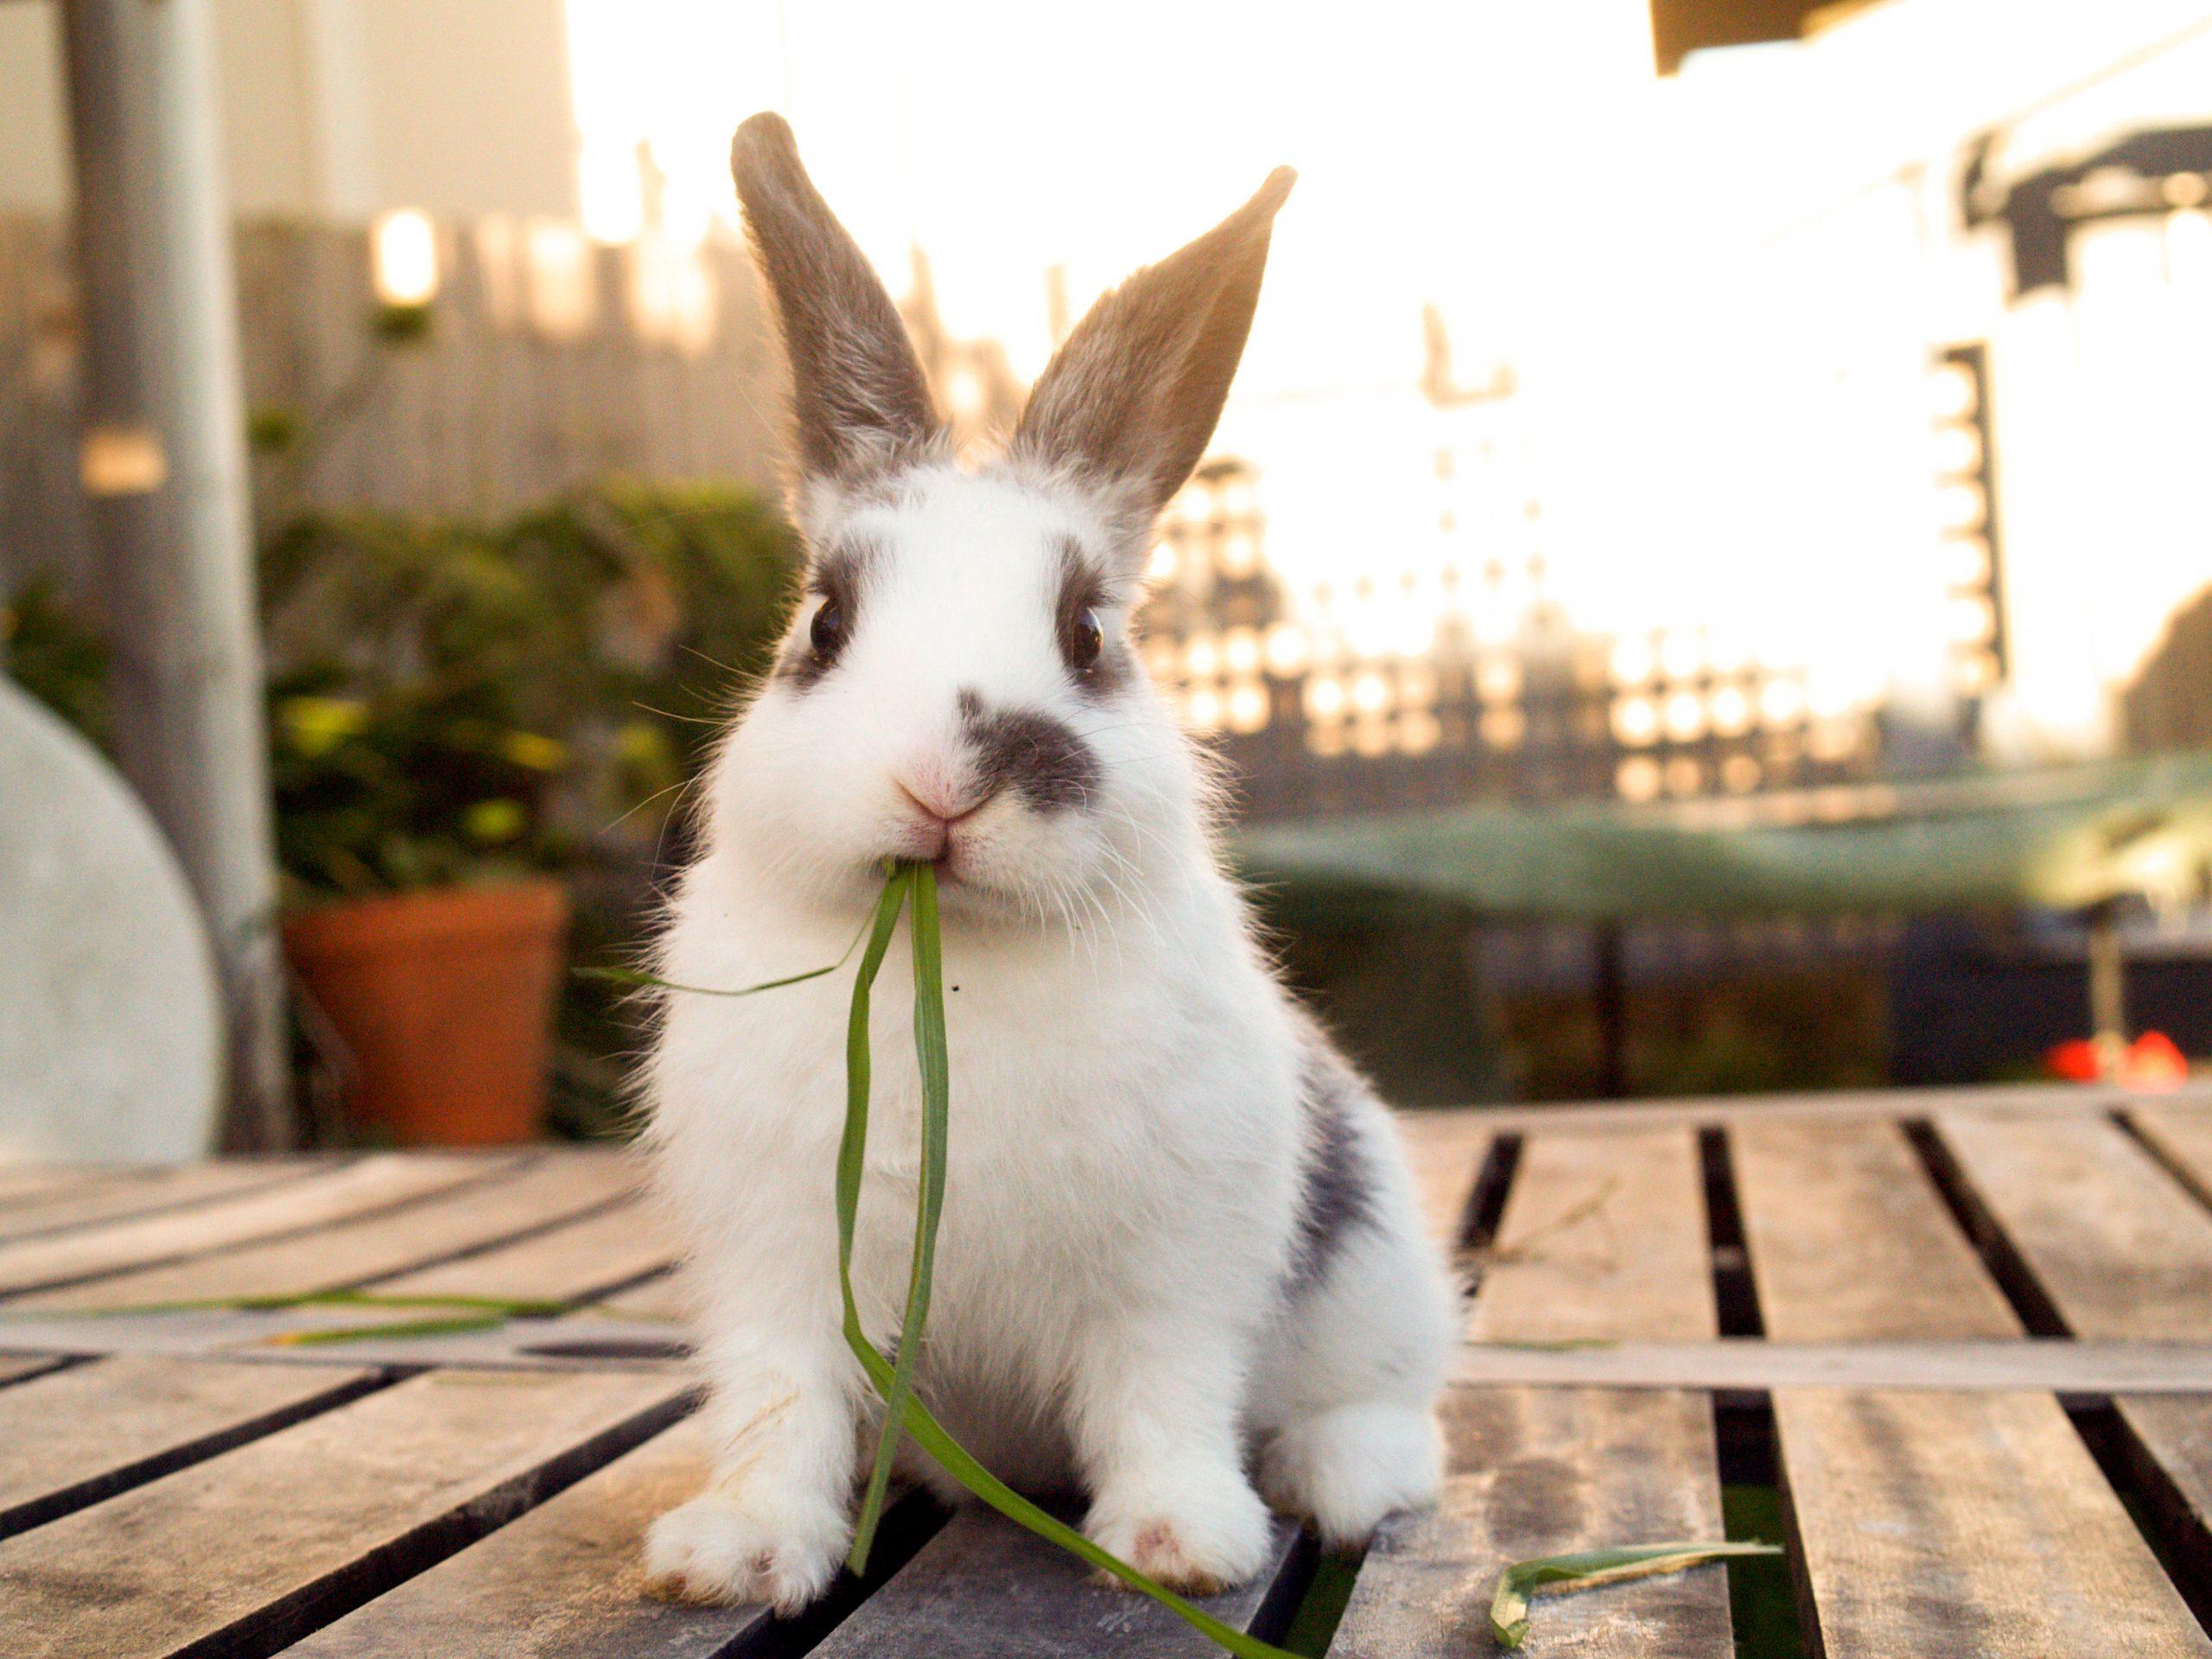 Pet baby rabbit eating grass